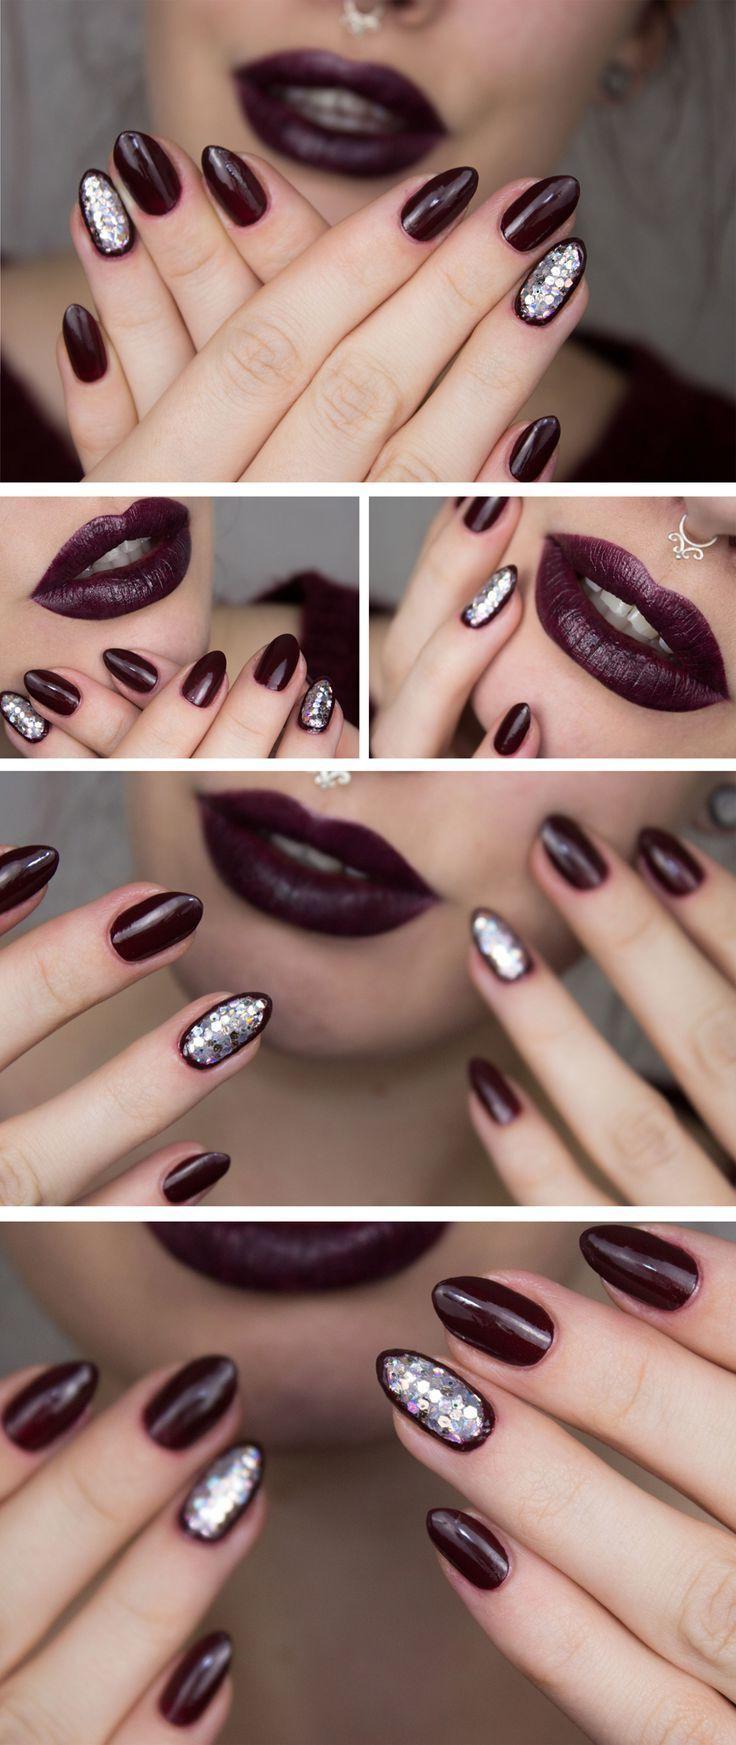 480 besten BEAUTY Bilder auf Pinterest   Beauty make-up, Augen ...